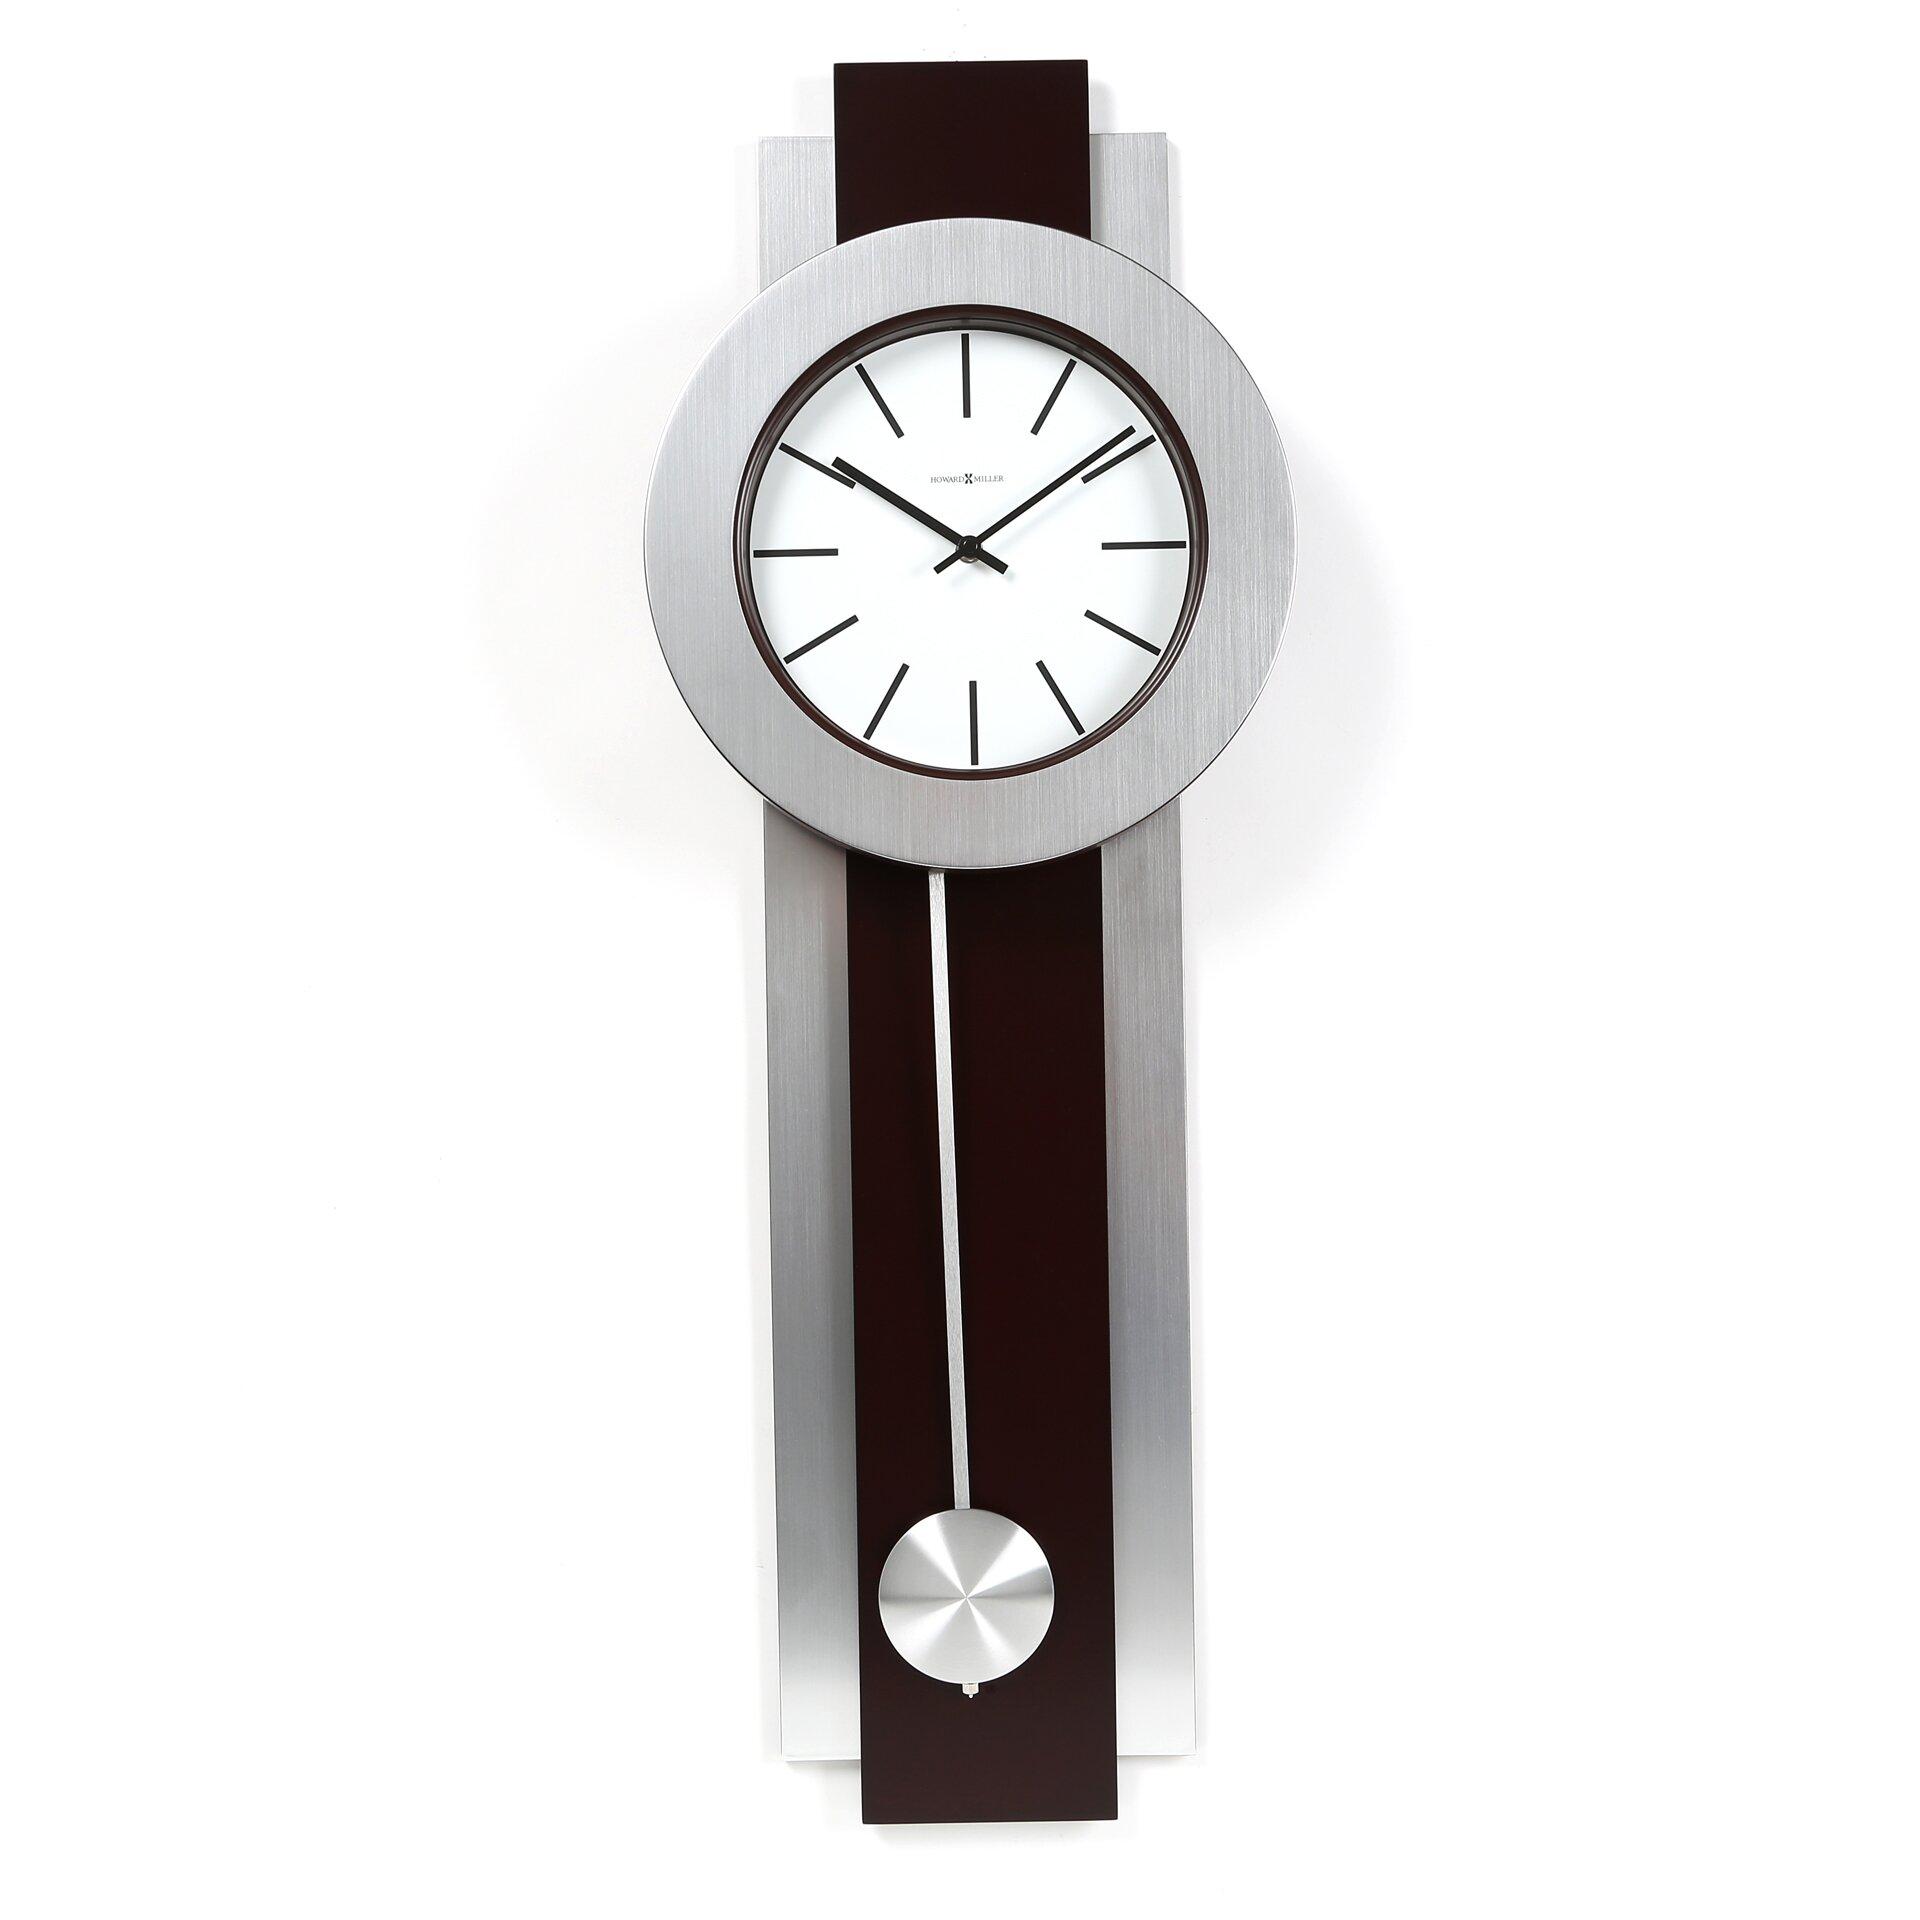 Kitchen Wall Clocks Modern Modern Contemporary Wall Clocks Youll Love Wayfair